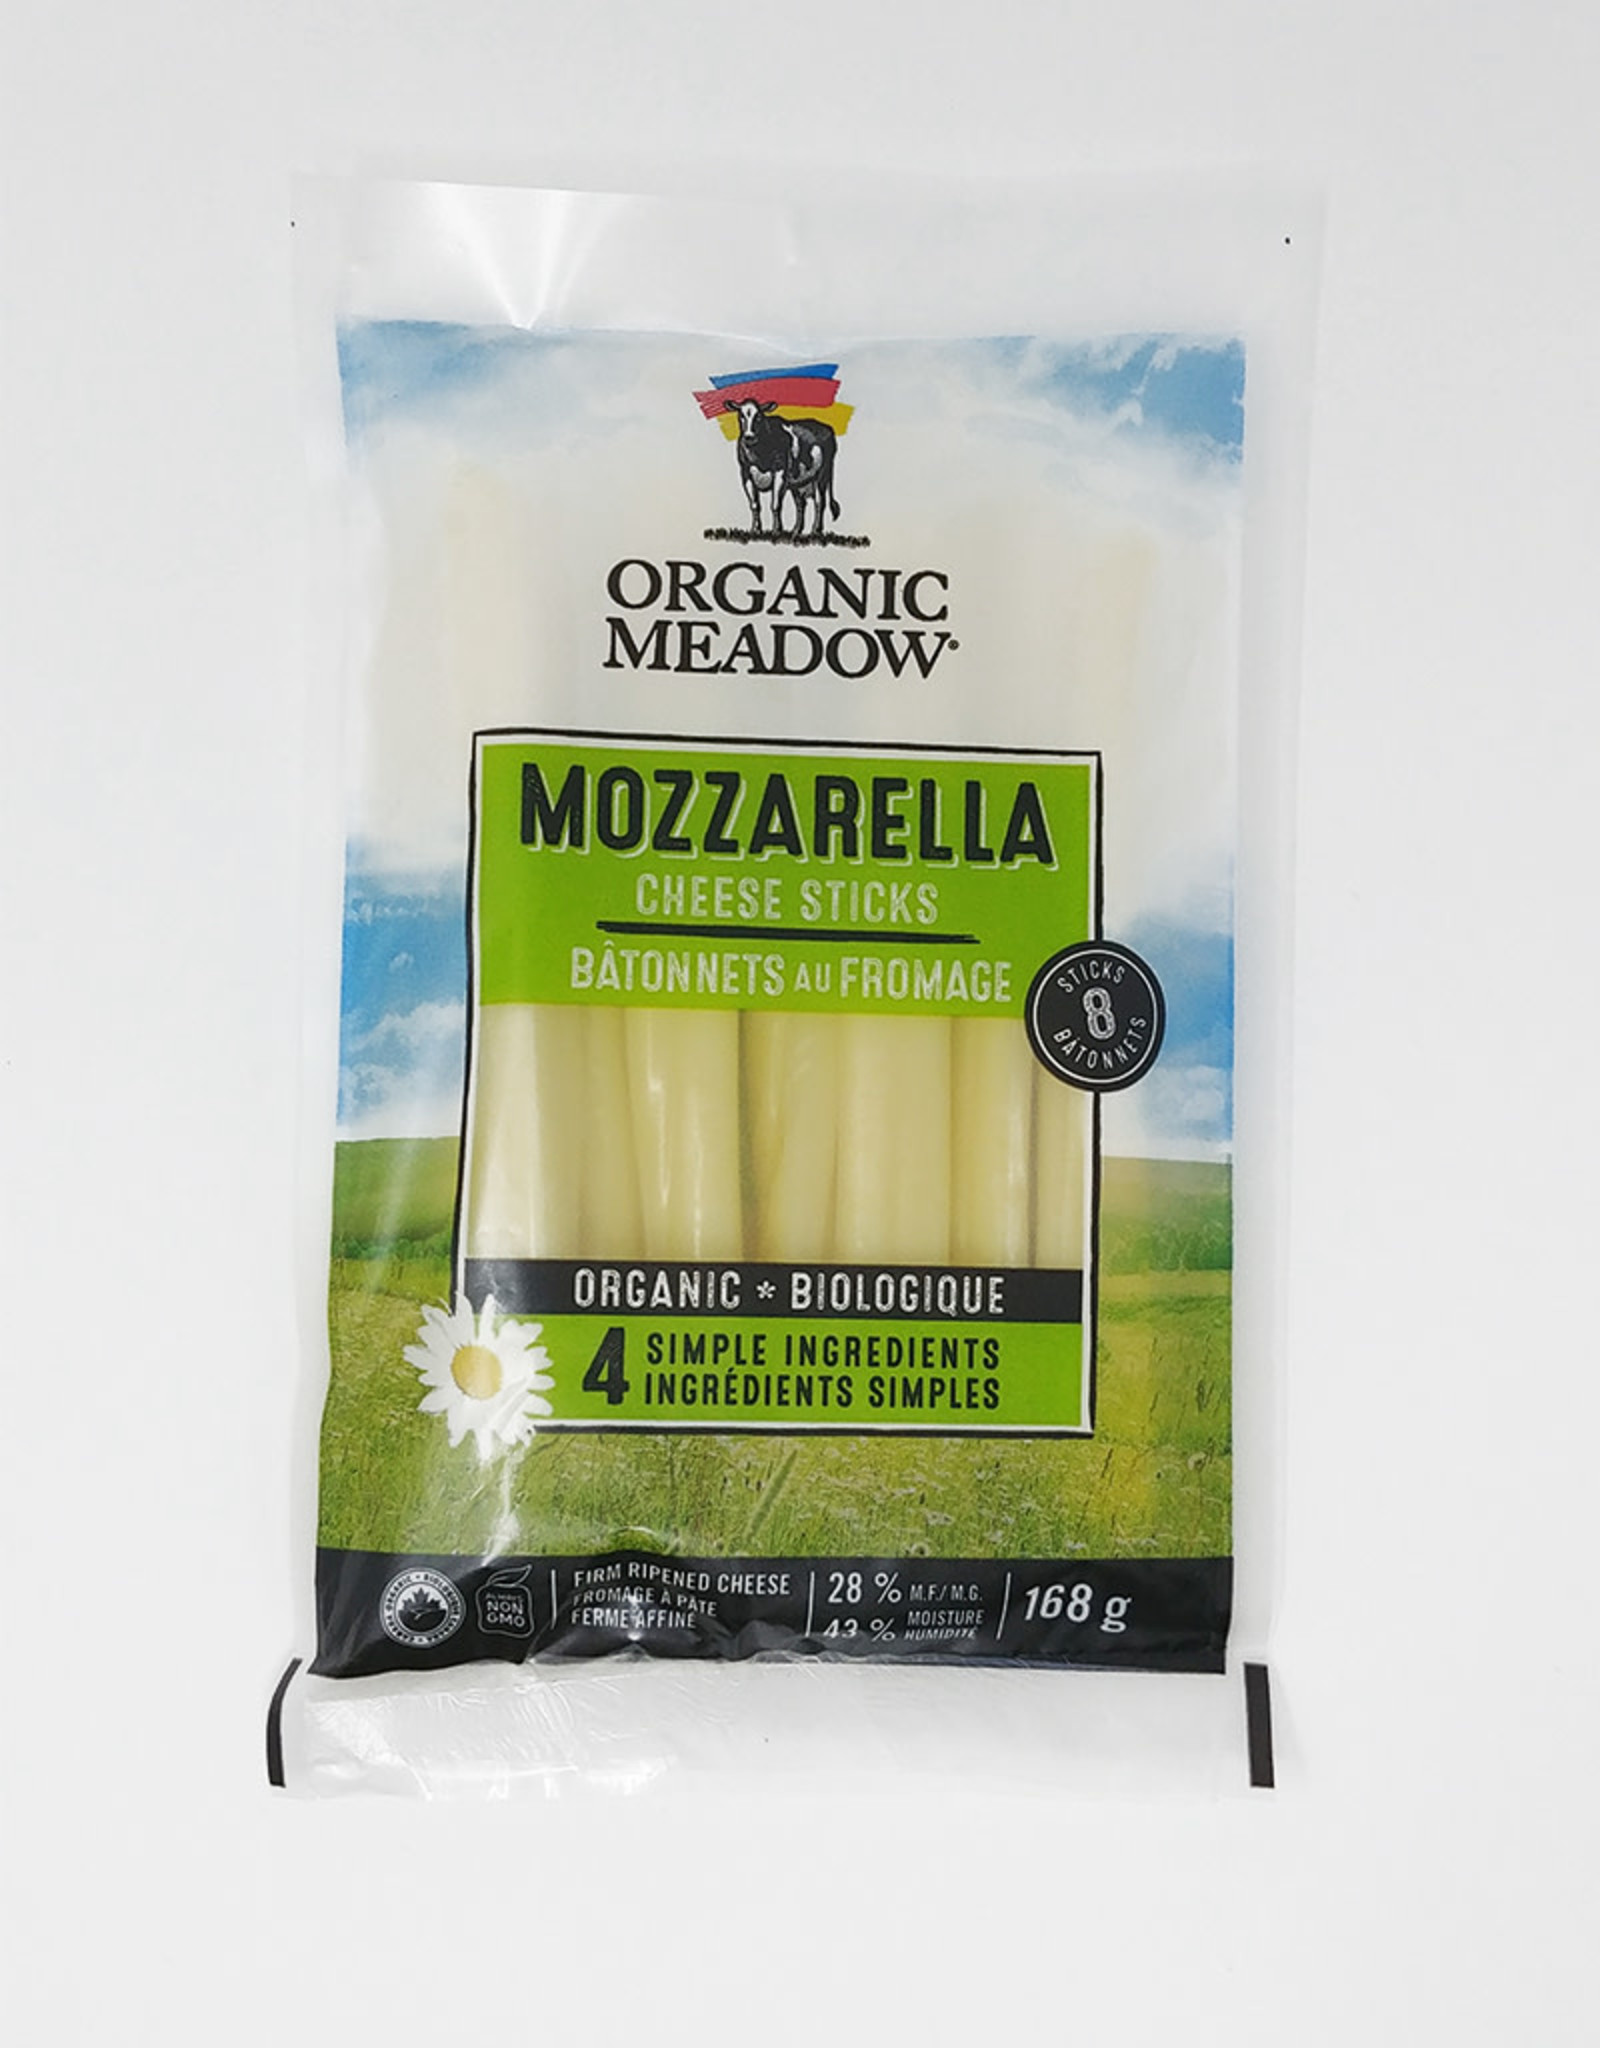 Organic Meadow Organic Meadow - Cheese Sticks, Mozzarella (168g)